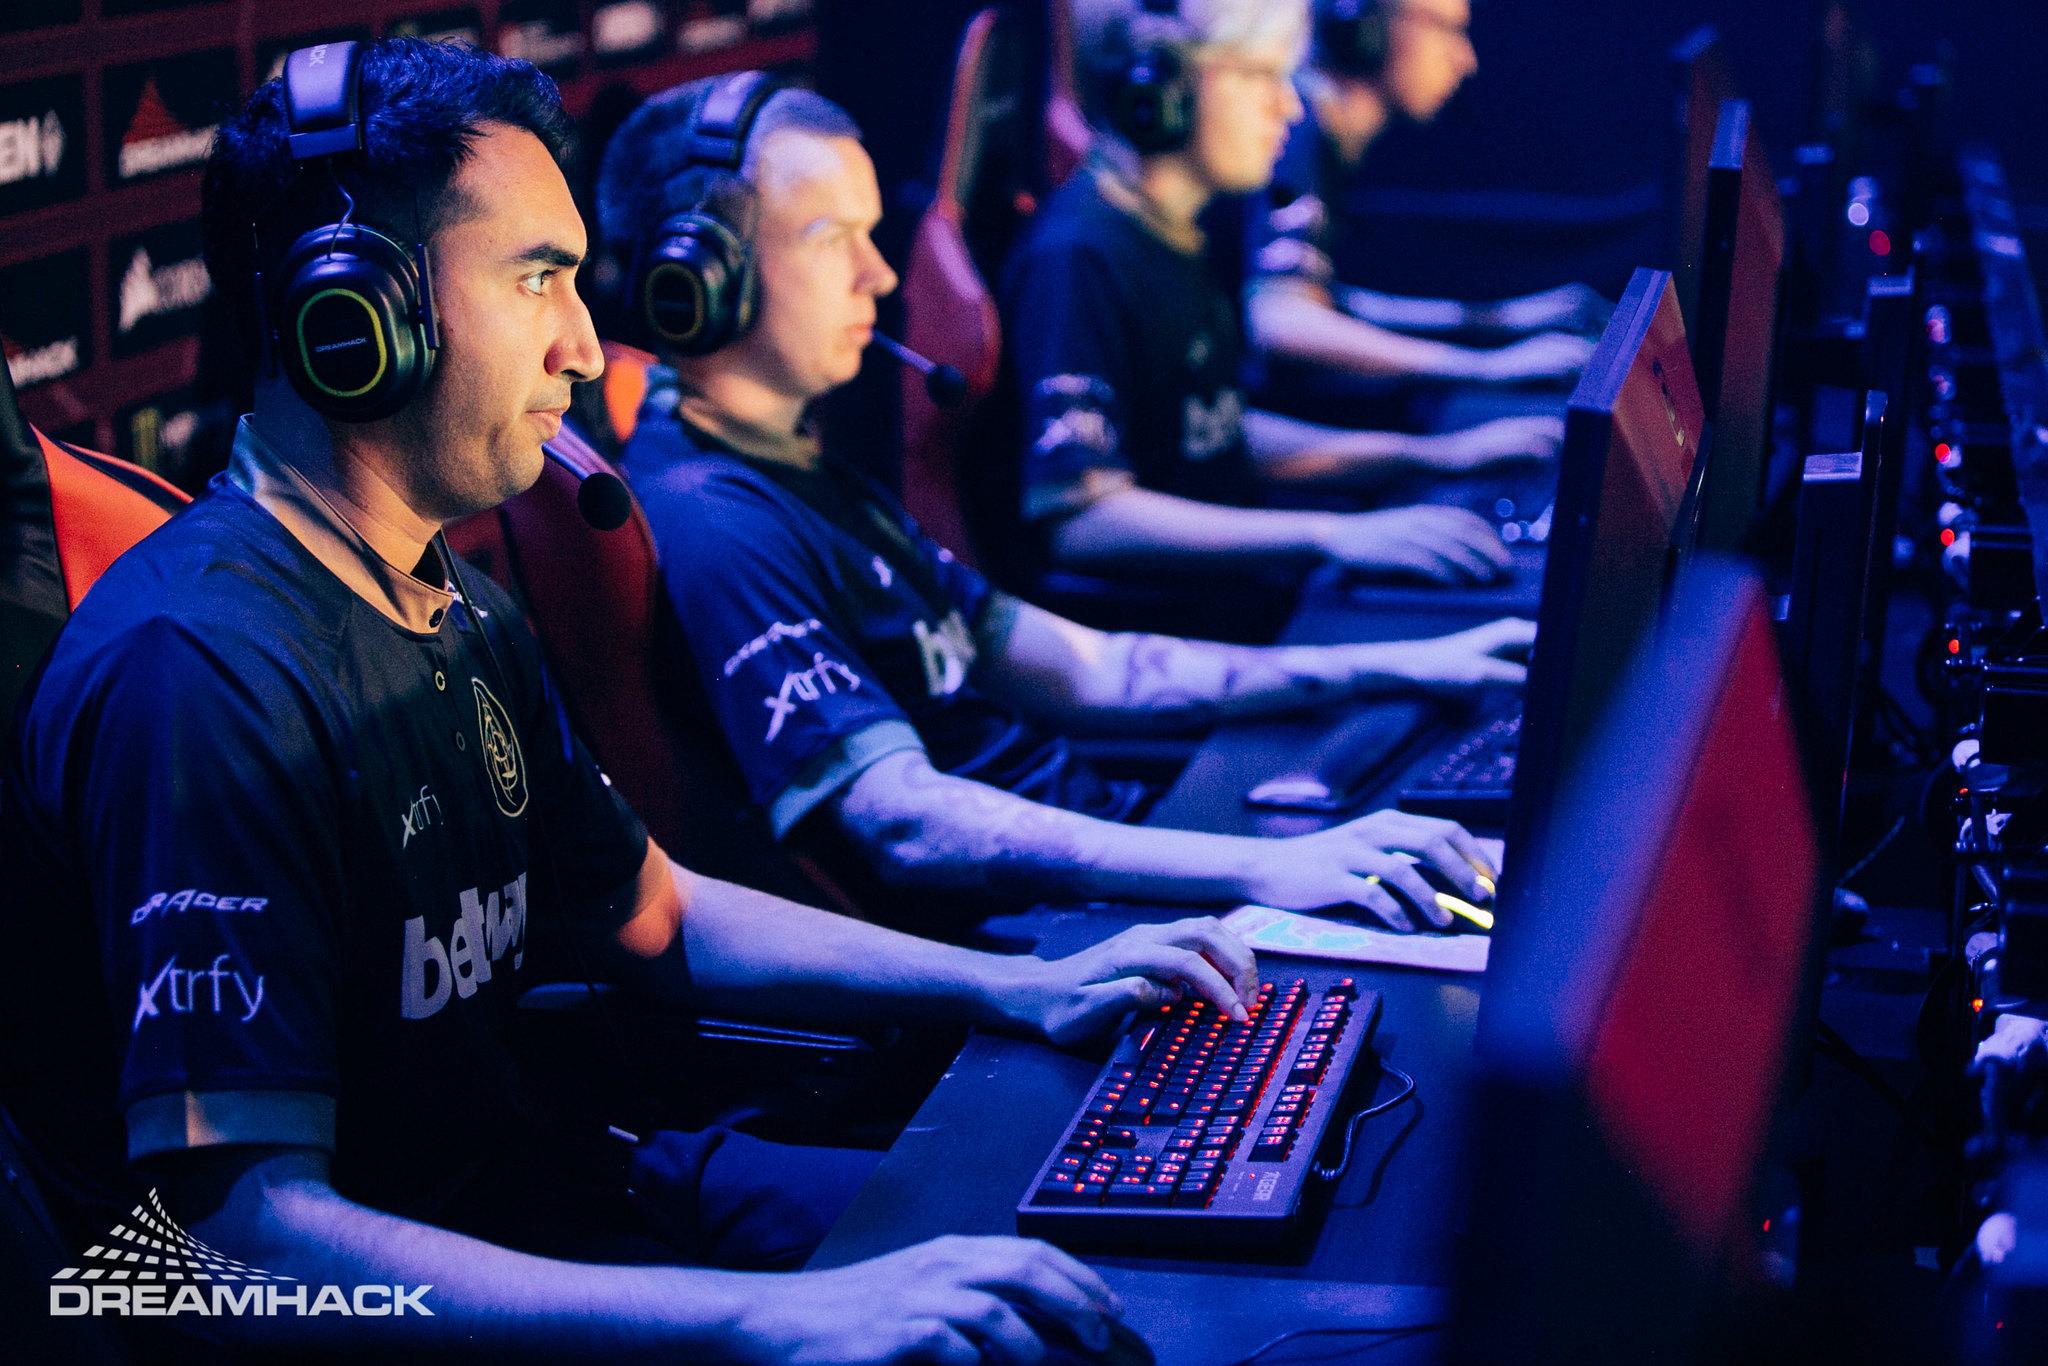 Universe retires from Dota 2 | Dot Esports